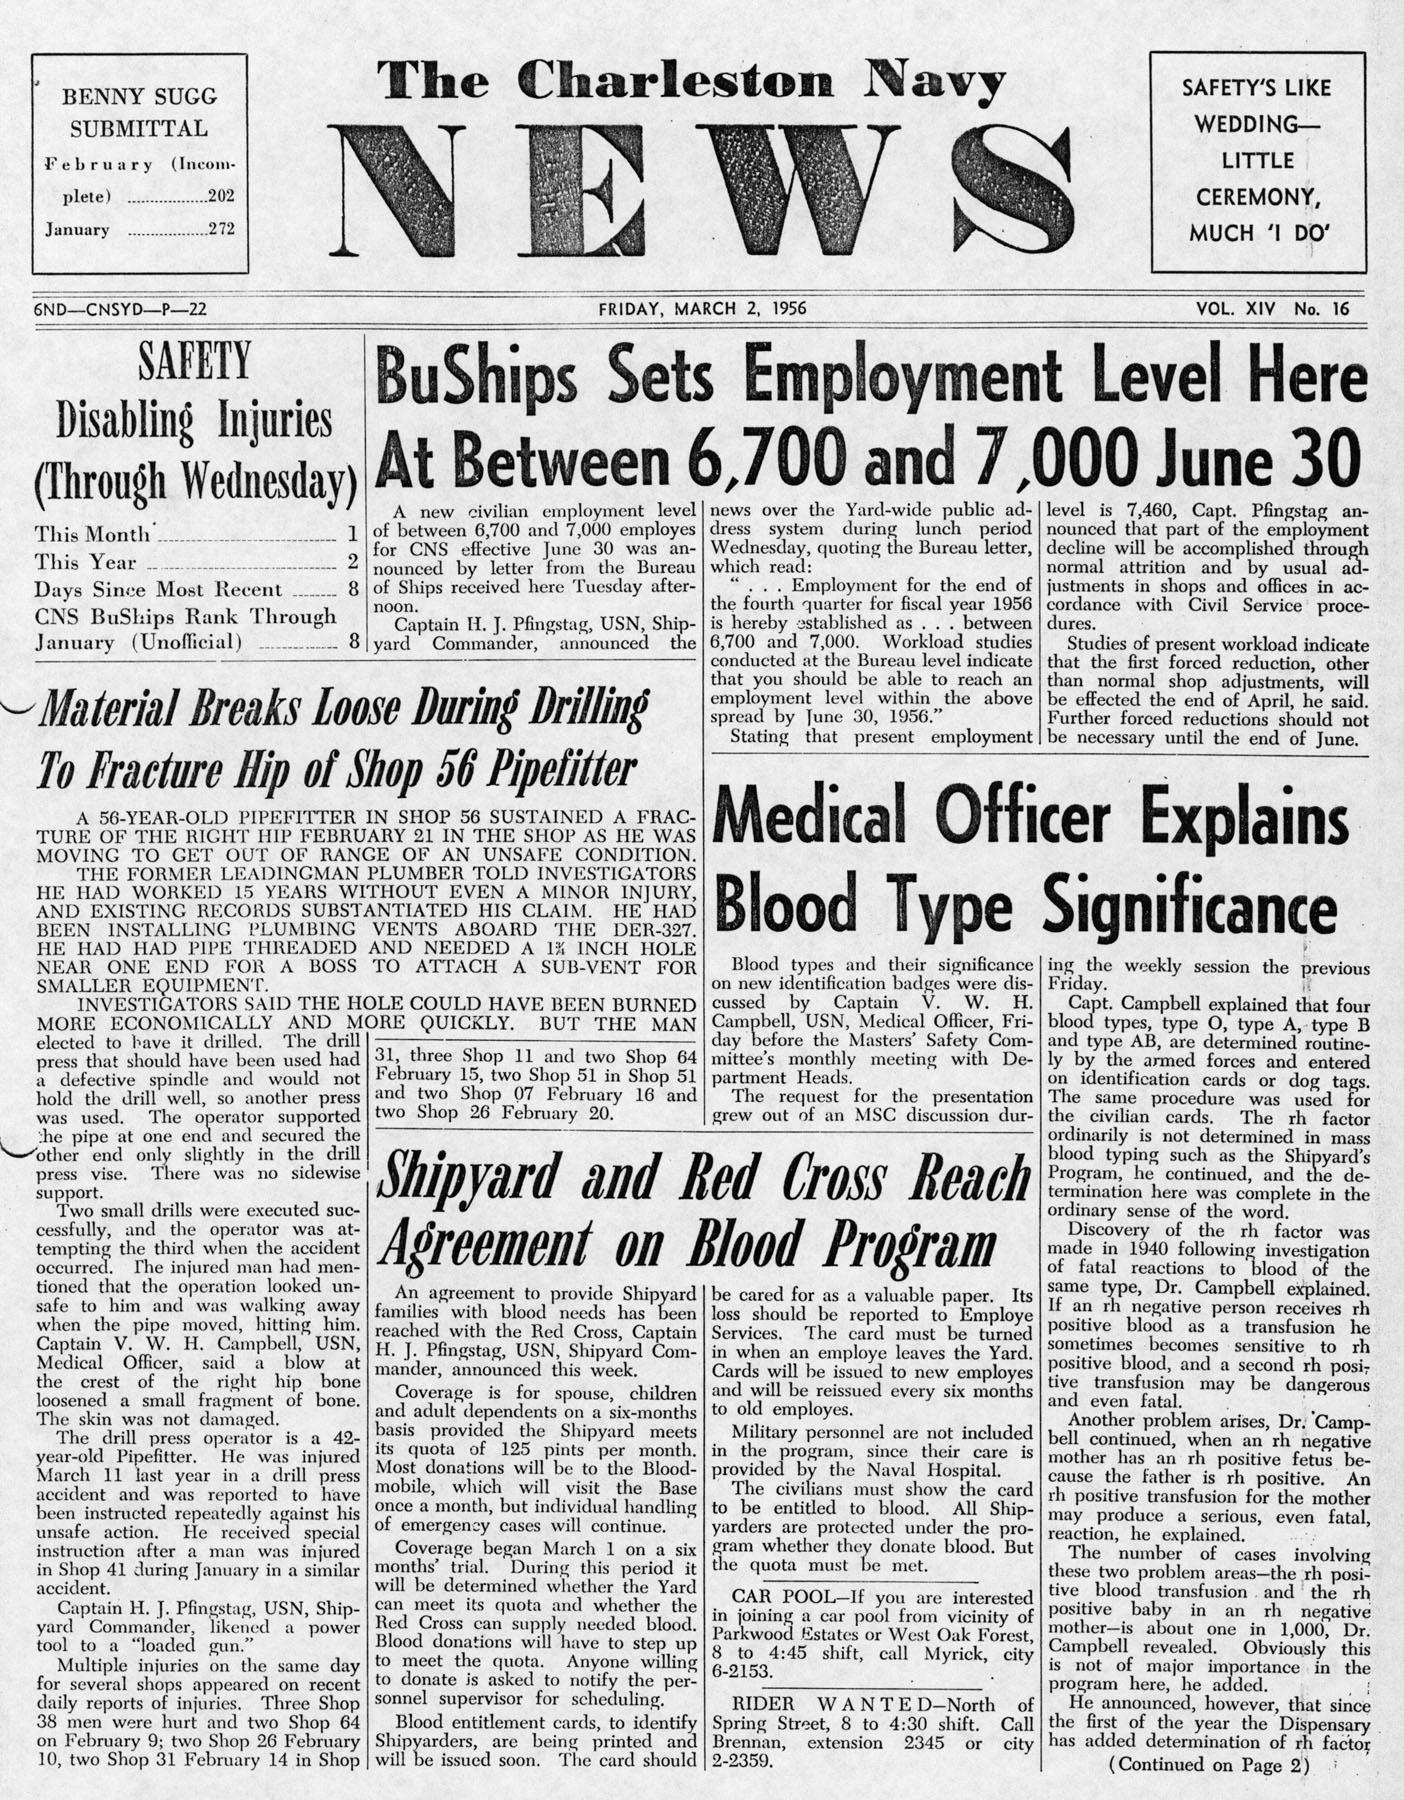 The Charleston Navy News, Volume 14, Edition 16, page i